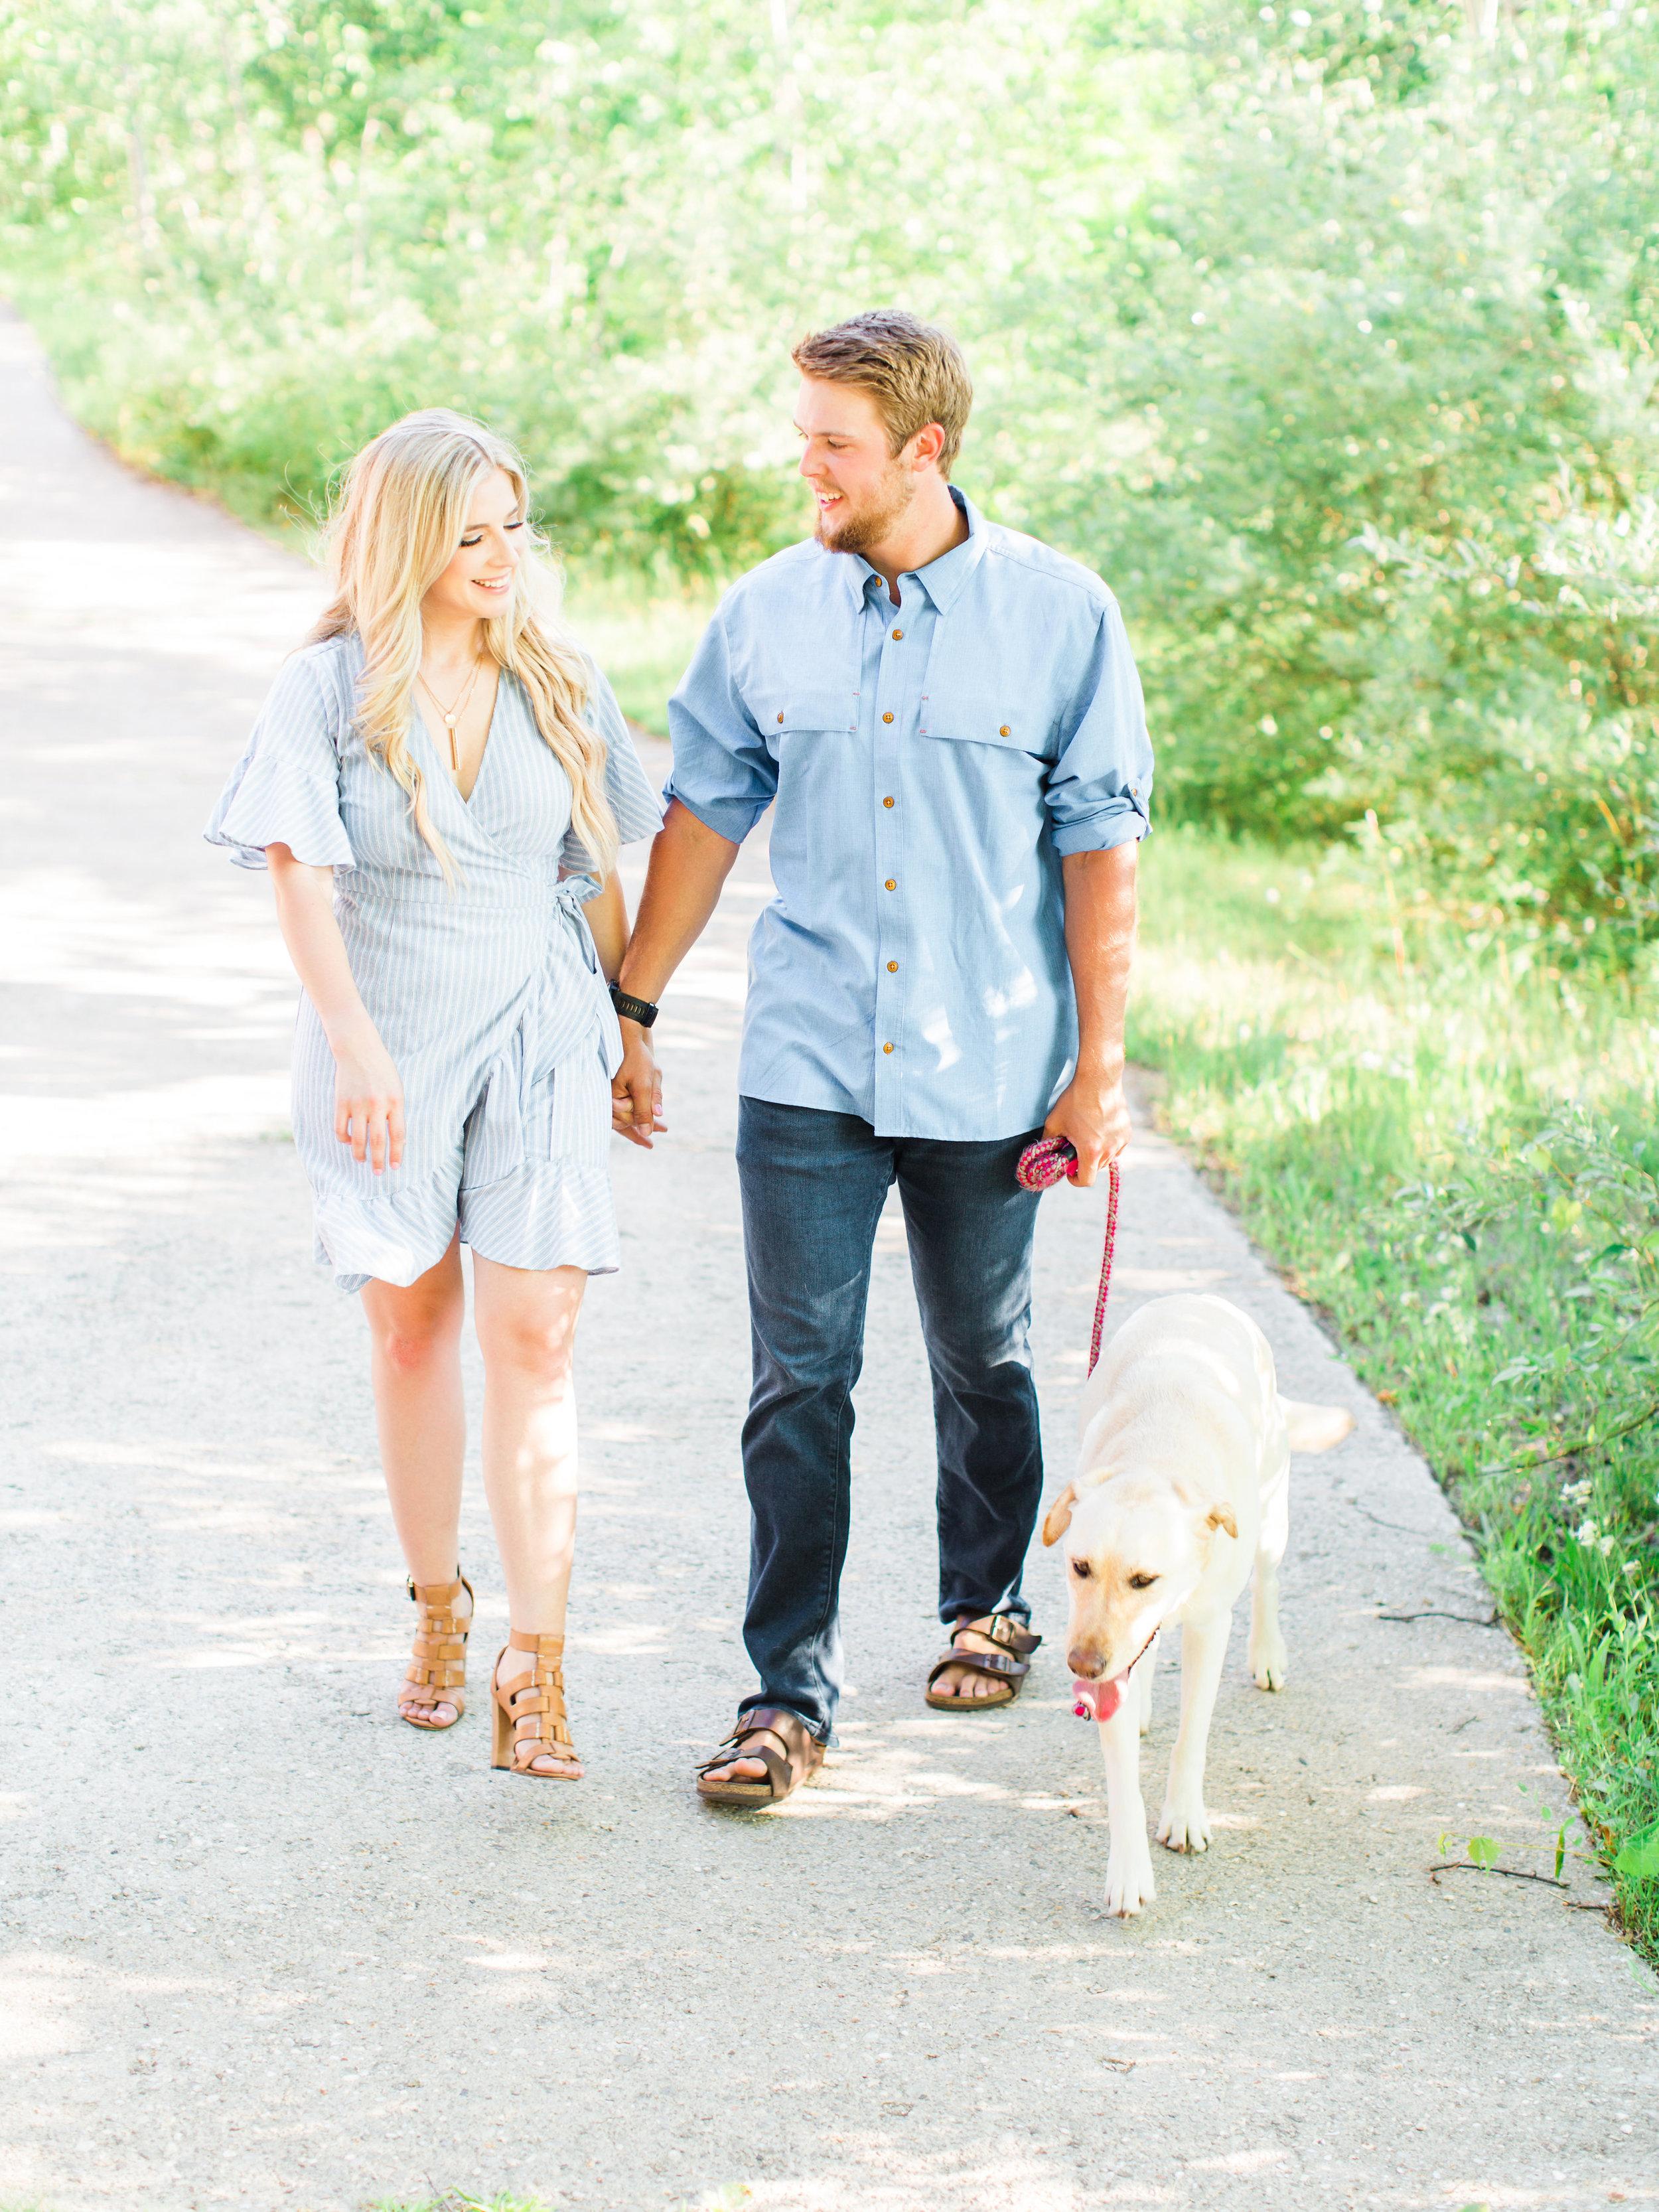 Hannah+Kyle+Engaged-15.jpg